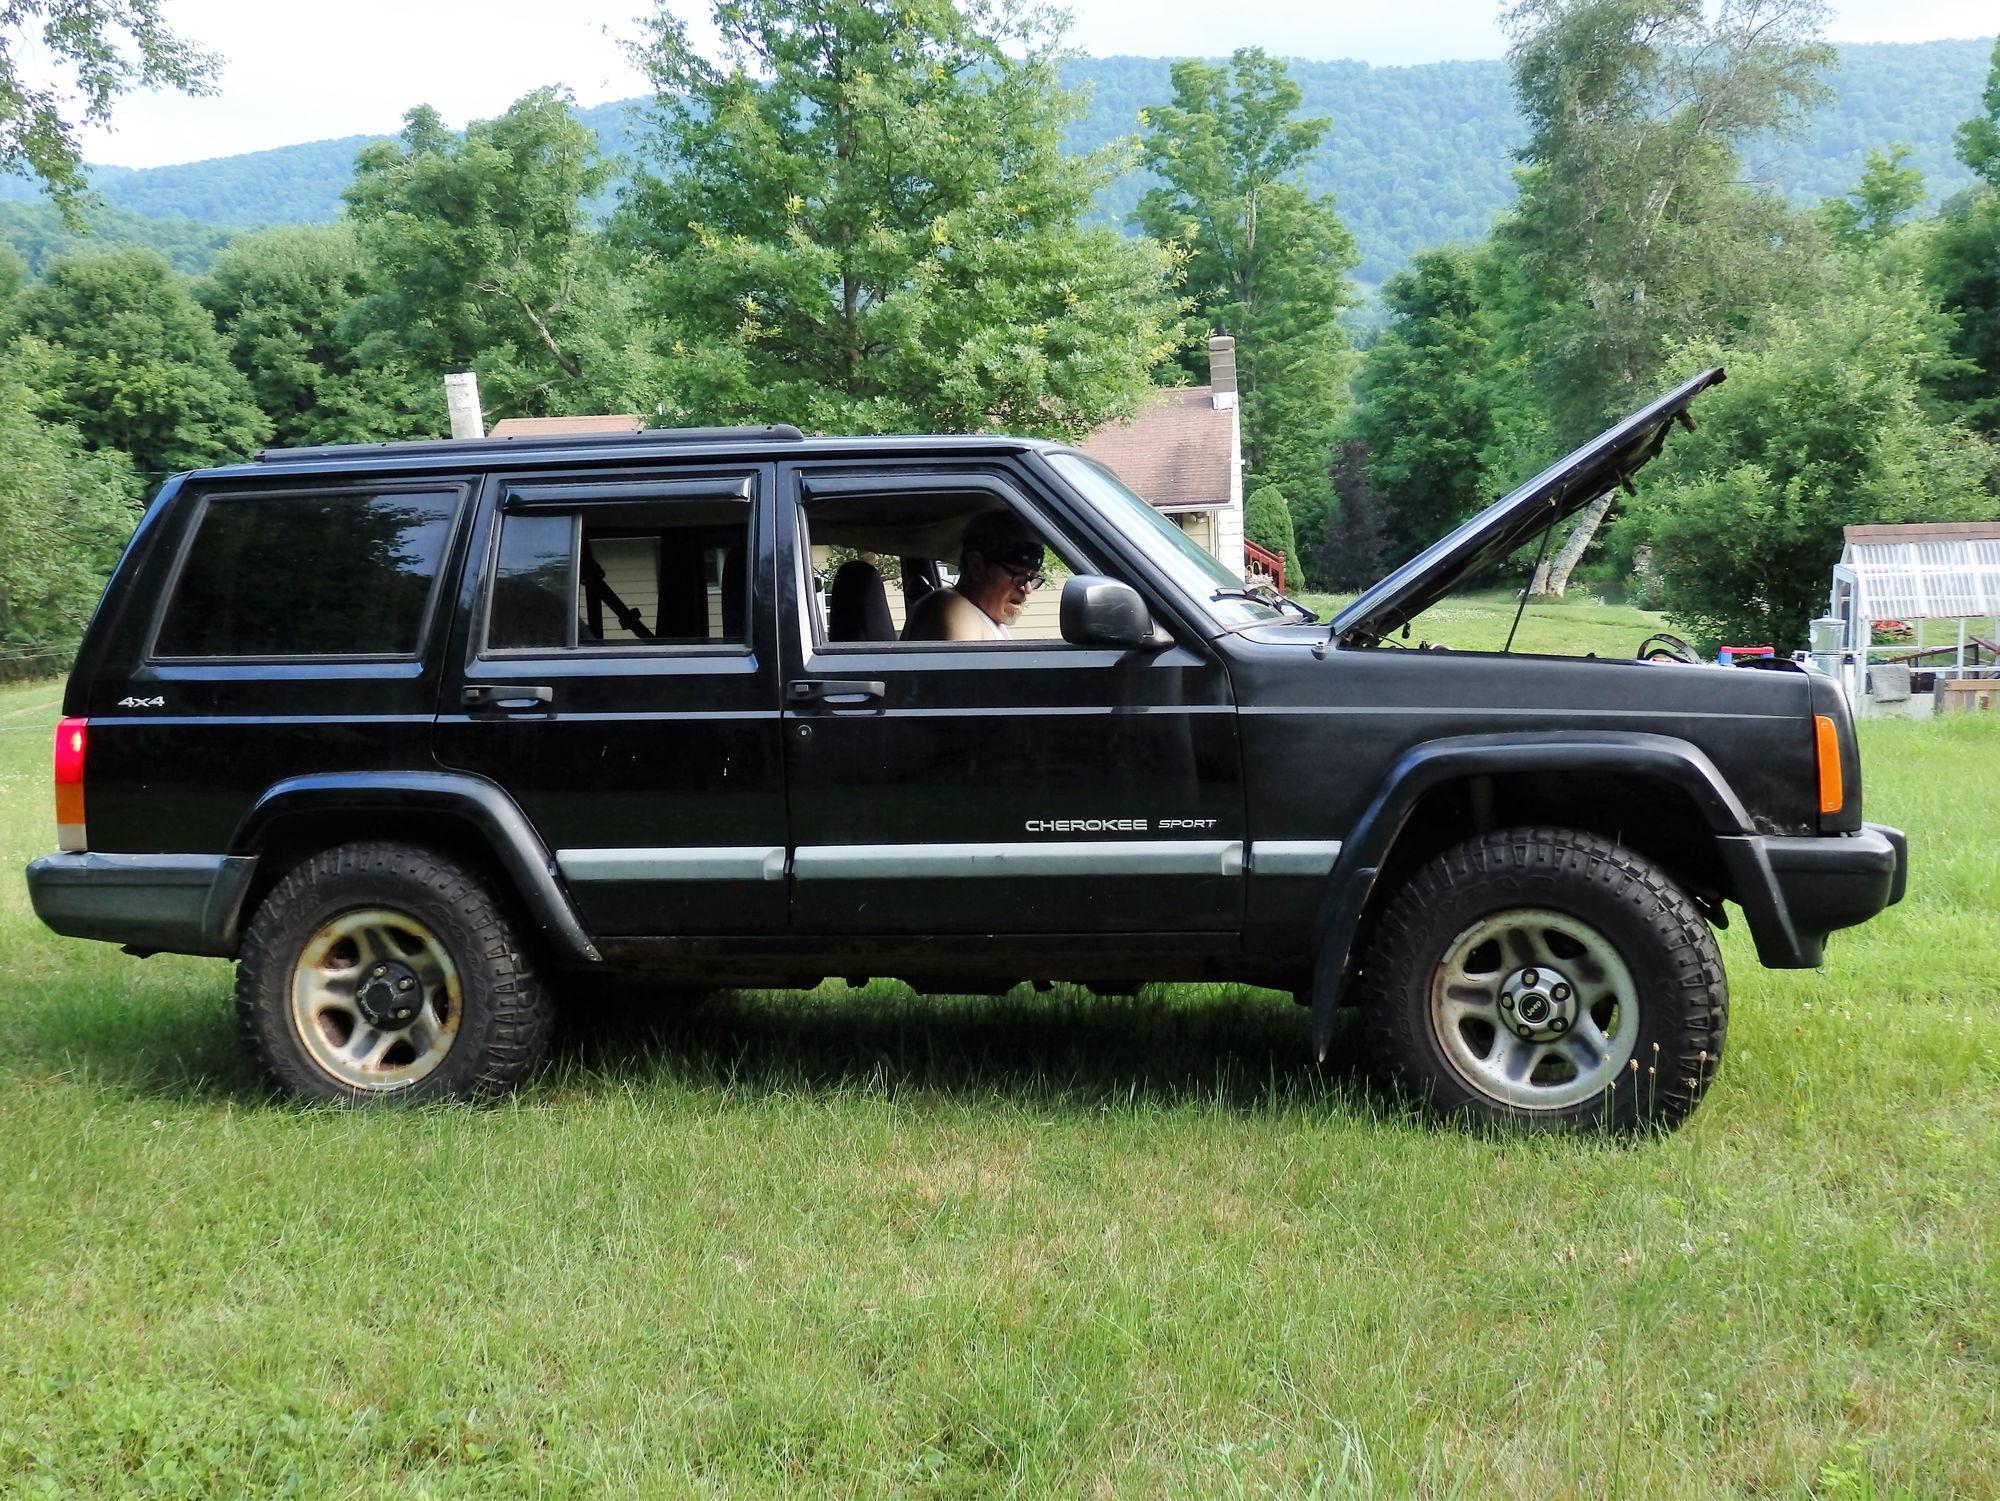 fs noratl 2000 jeep cherokee sport parts bonanza jeep cherokee forum. Black Bedroom Furniture Sets. Home Design Ideas